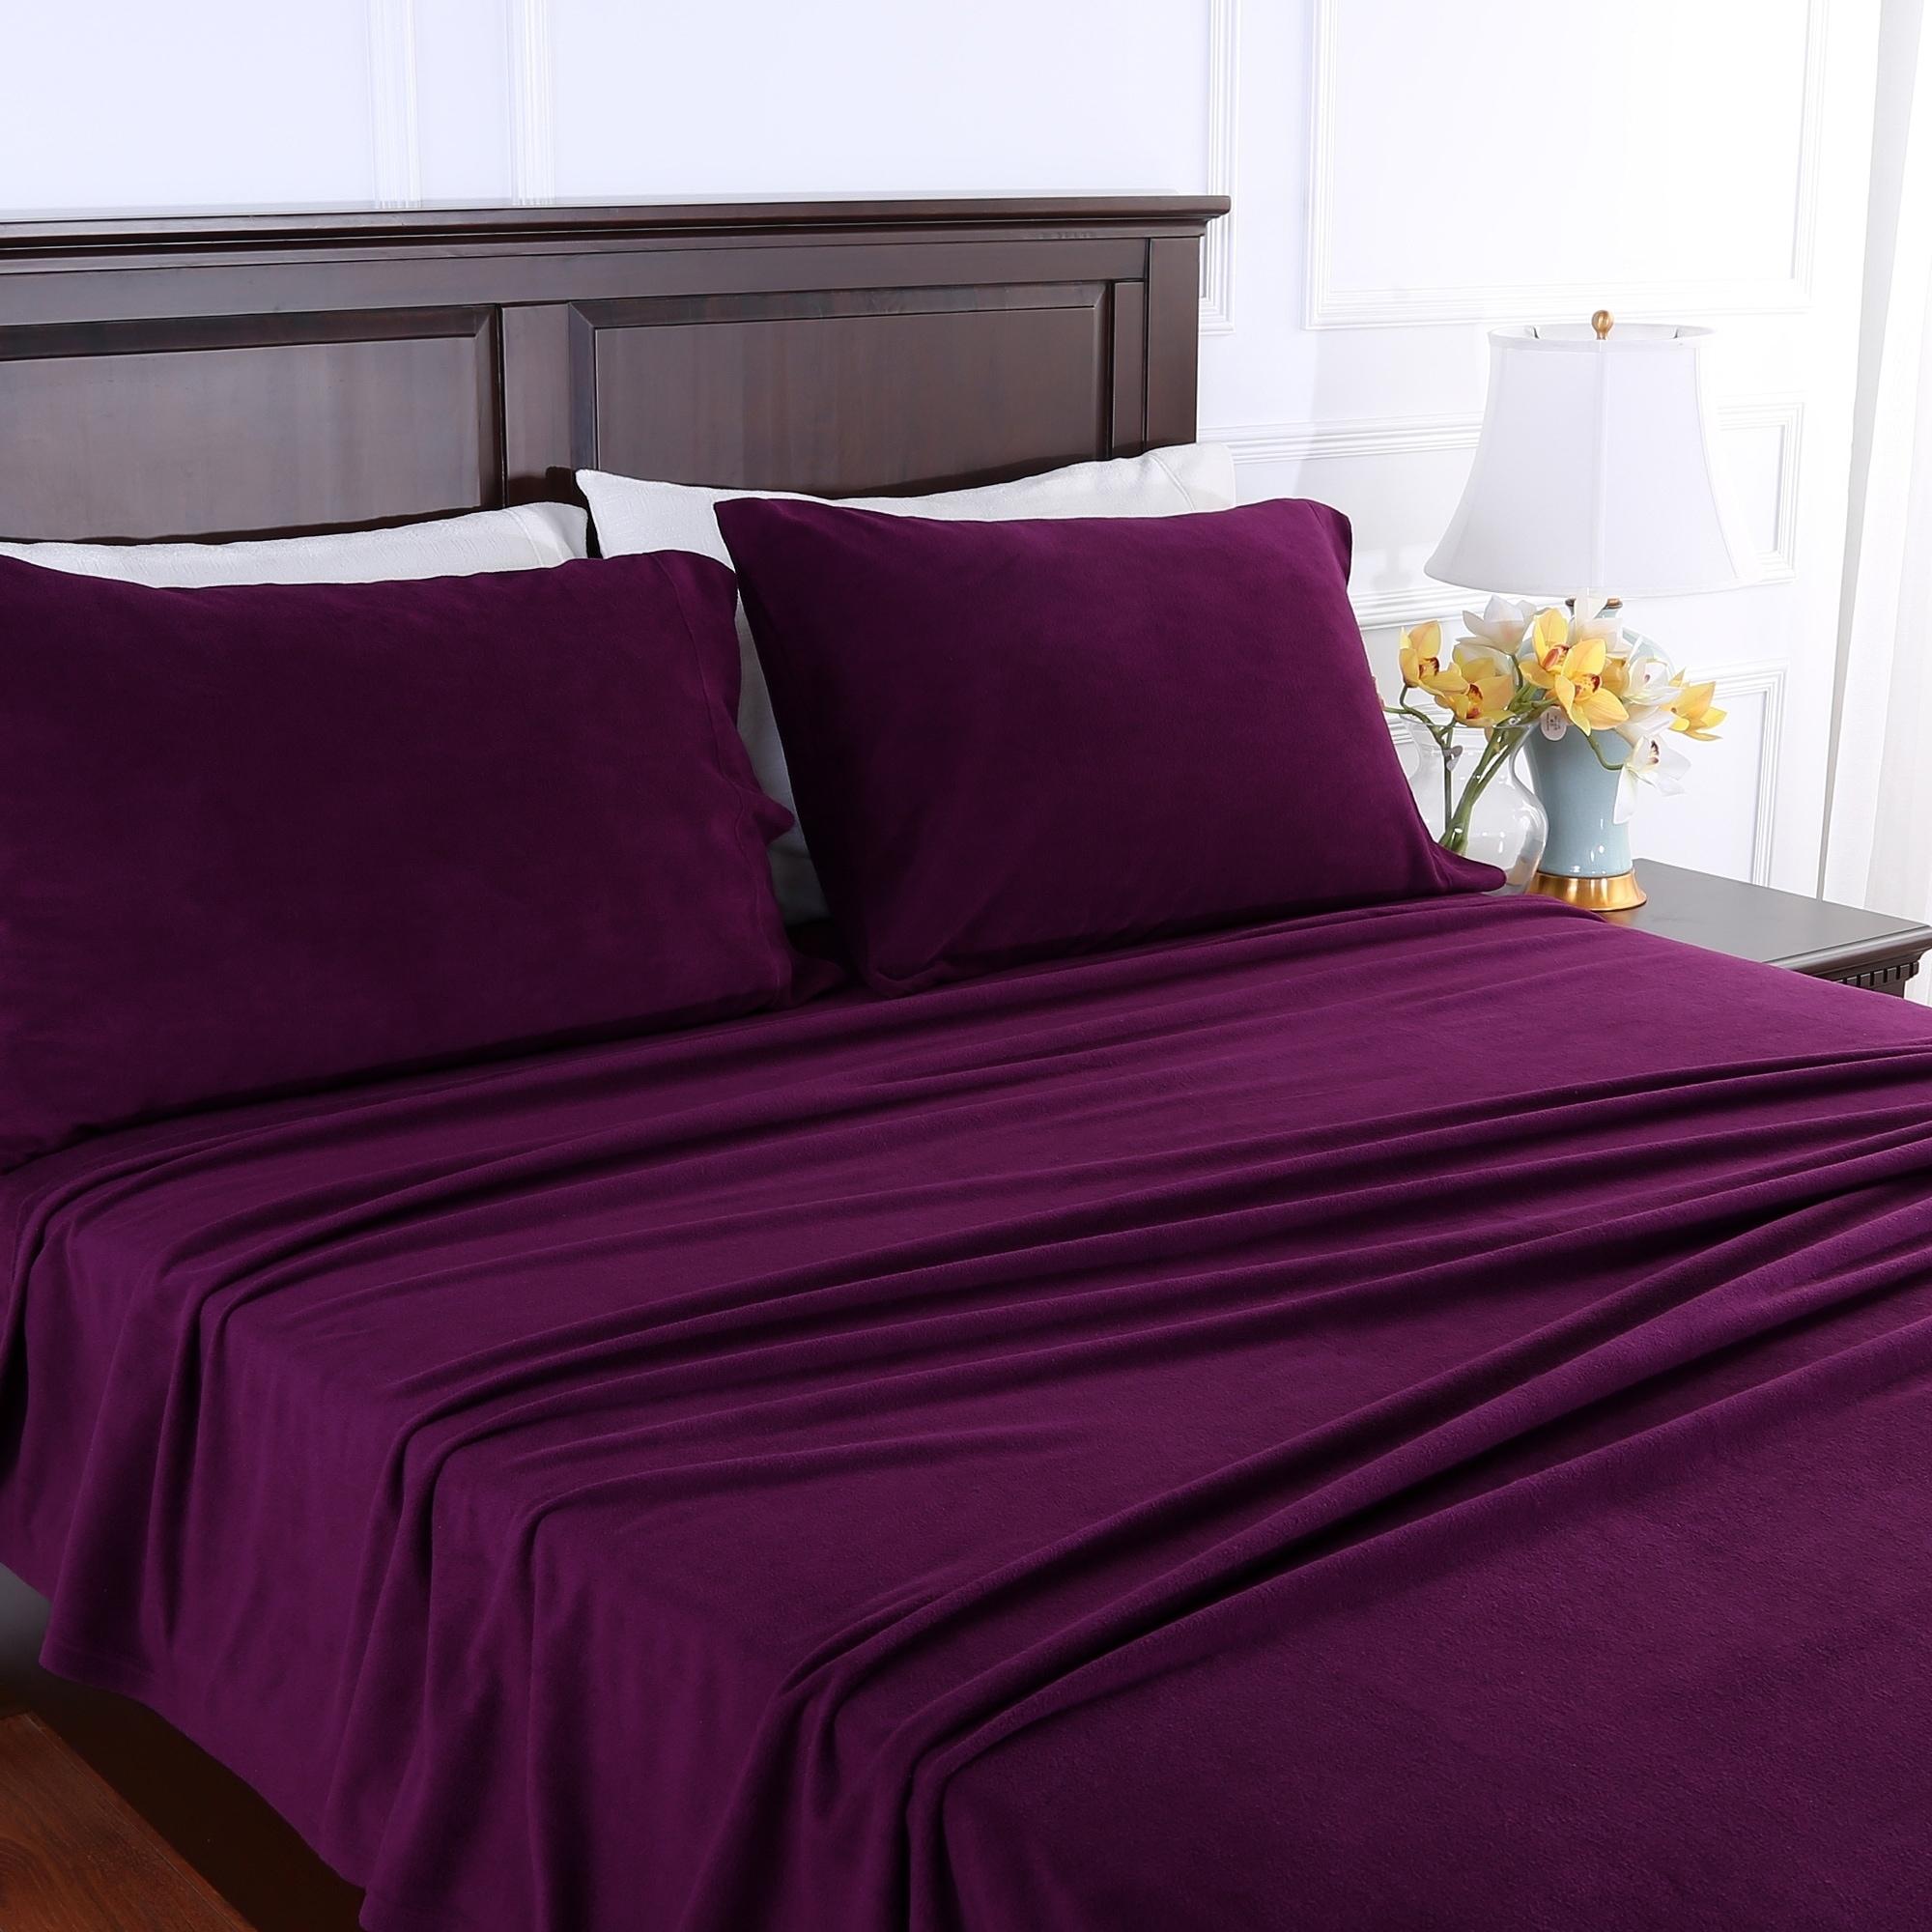 Genuine Microfleece Bed Sheet Set Warm Winter Color Palette On Sale Overstock 21018920